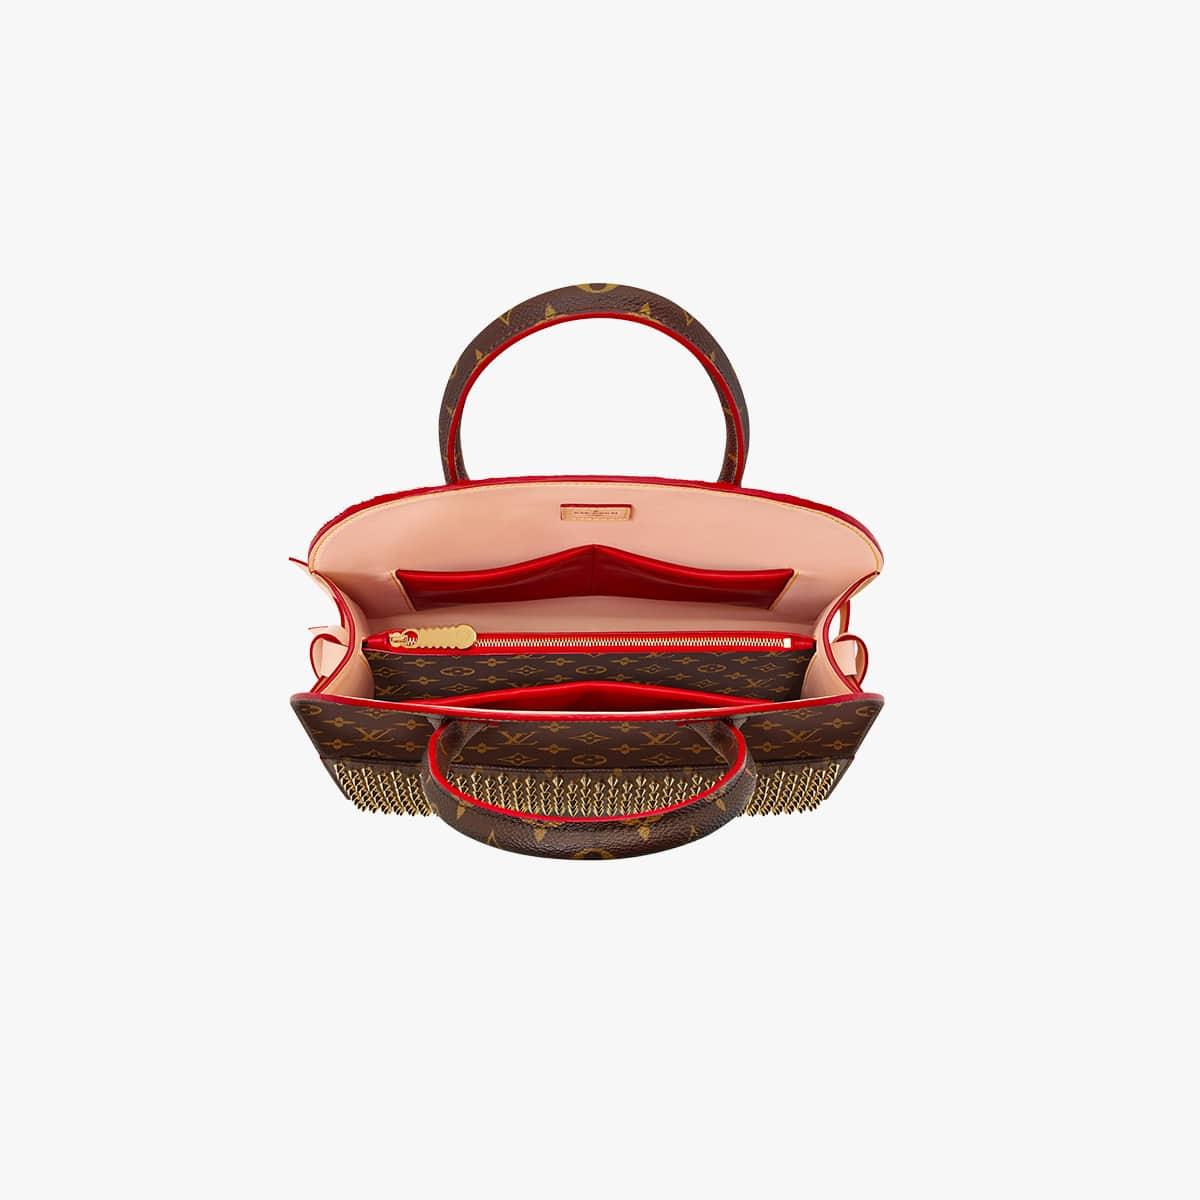 Louis Vuitton Monogram Iconoclasts Bag Collection